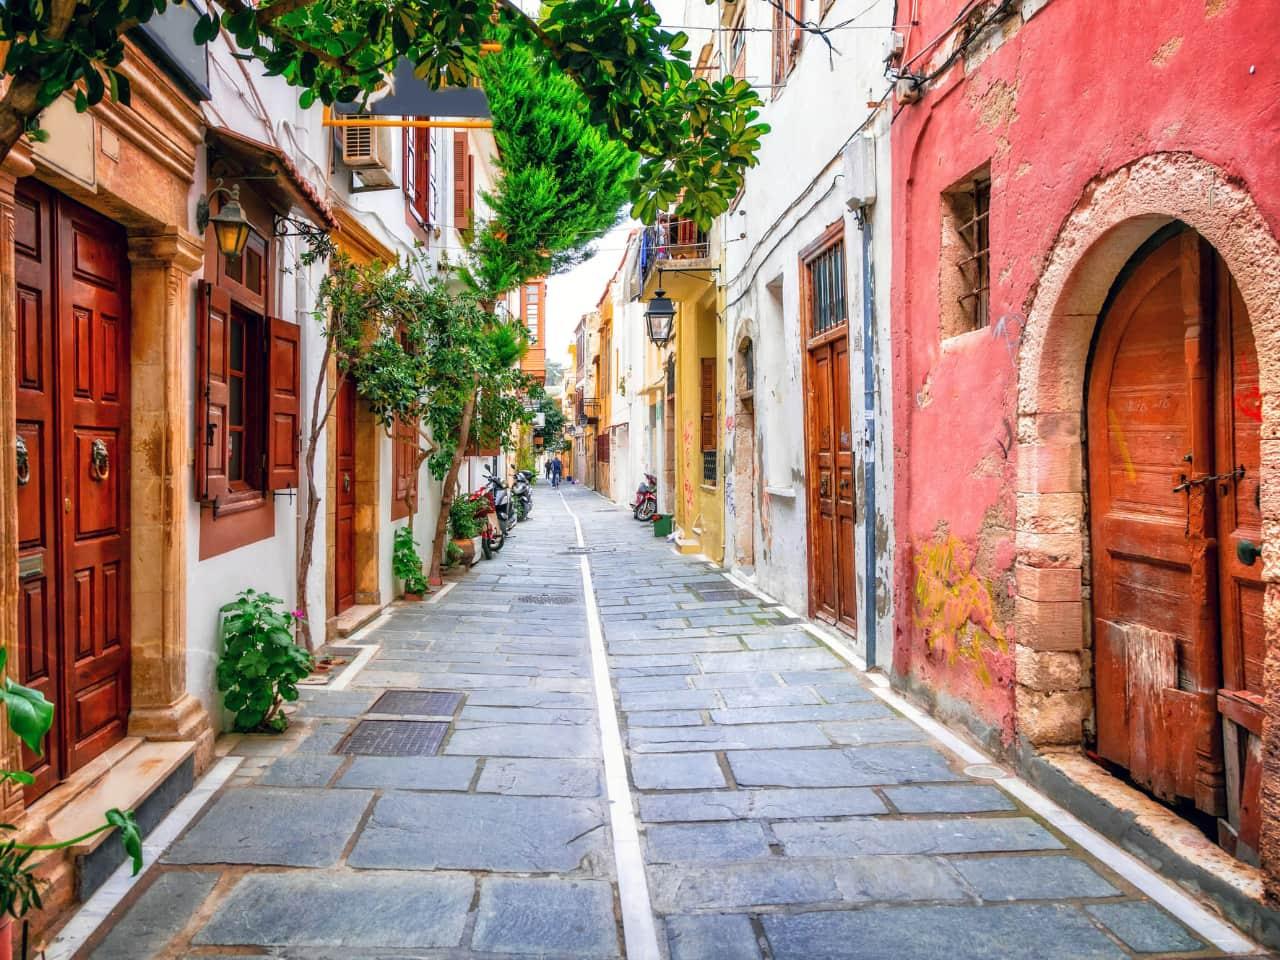 rethimno rethymno travel guide, rethimno city tour, rethimno hotels, rethymno gastronomy, rethymno activities, rethymno things to do, rethynmo venetian port, history of rethymno, museums of rethymno, churches of rethymno, what to do rethimno